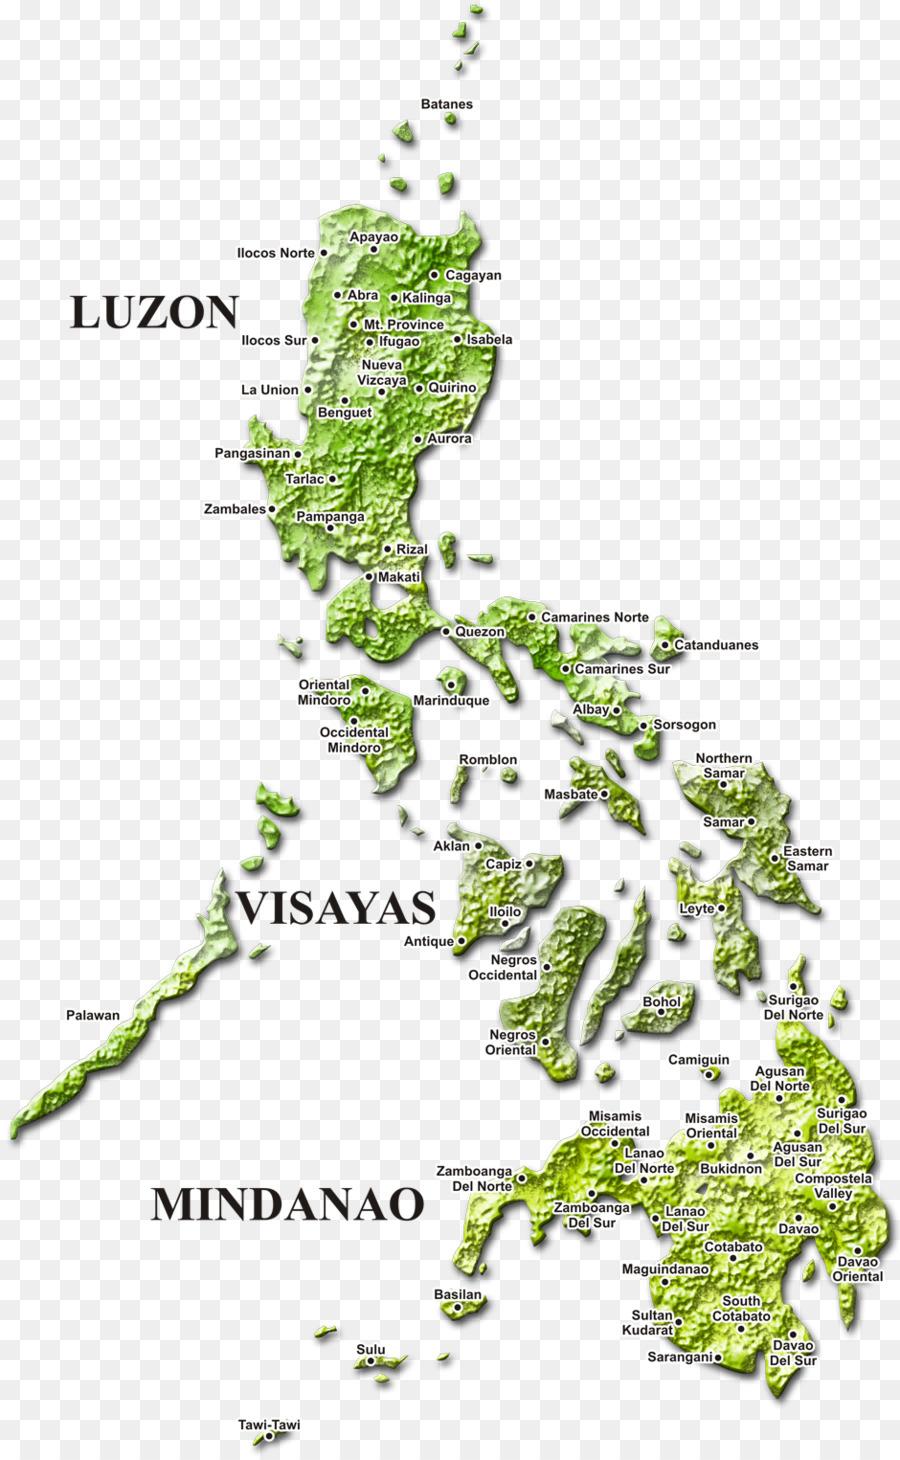 Philippines world map image desktop wallpaper map png download philippines world map image desktop wallpaper map gumiabroncs Image collections